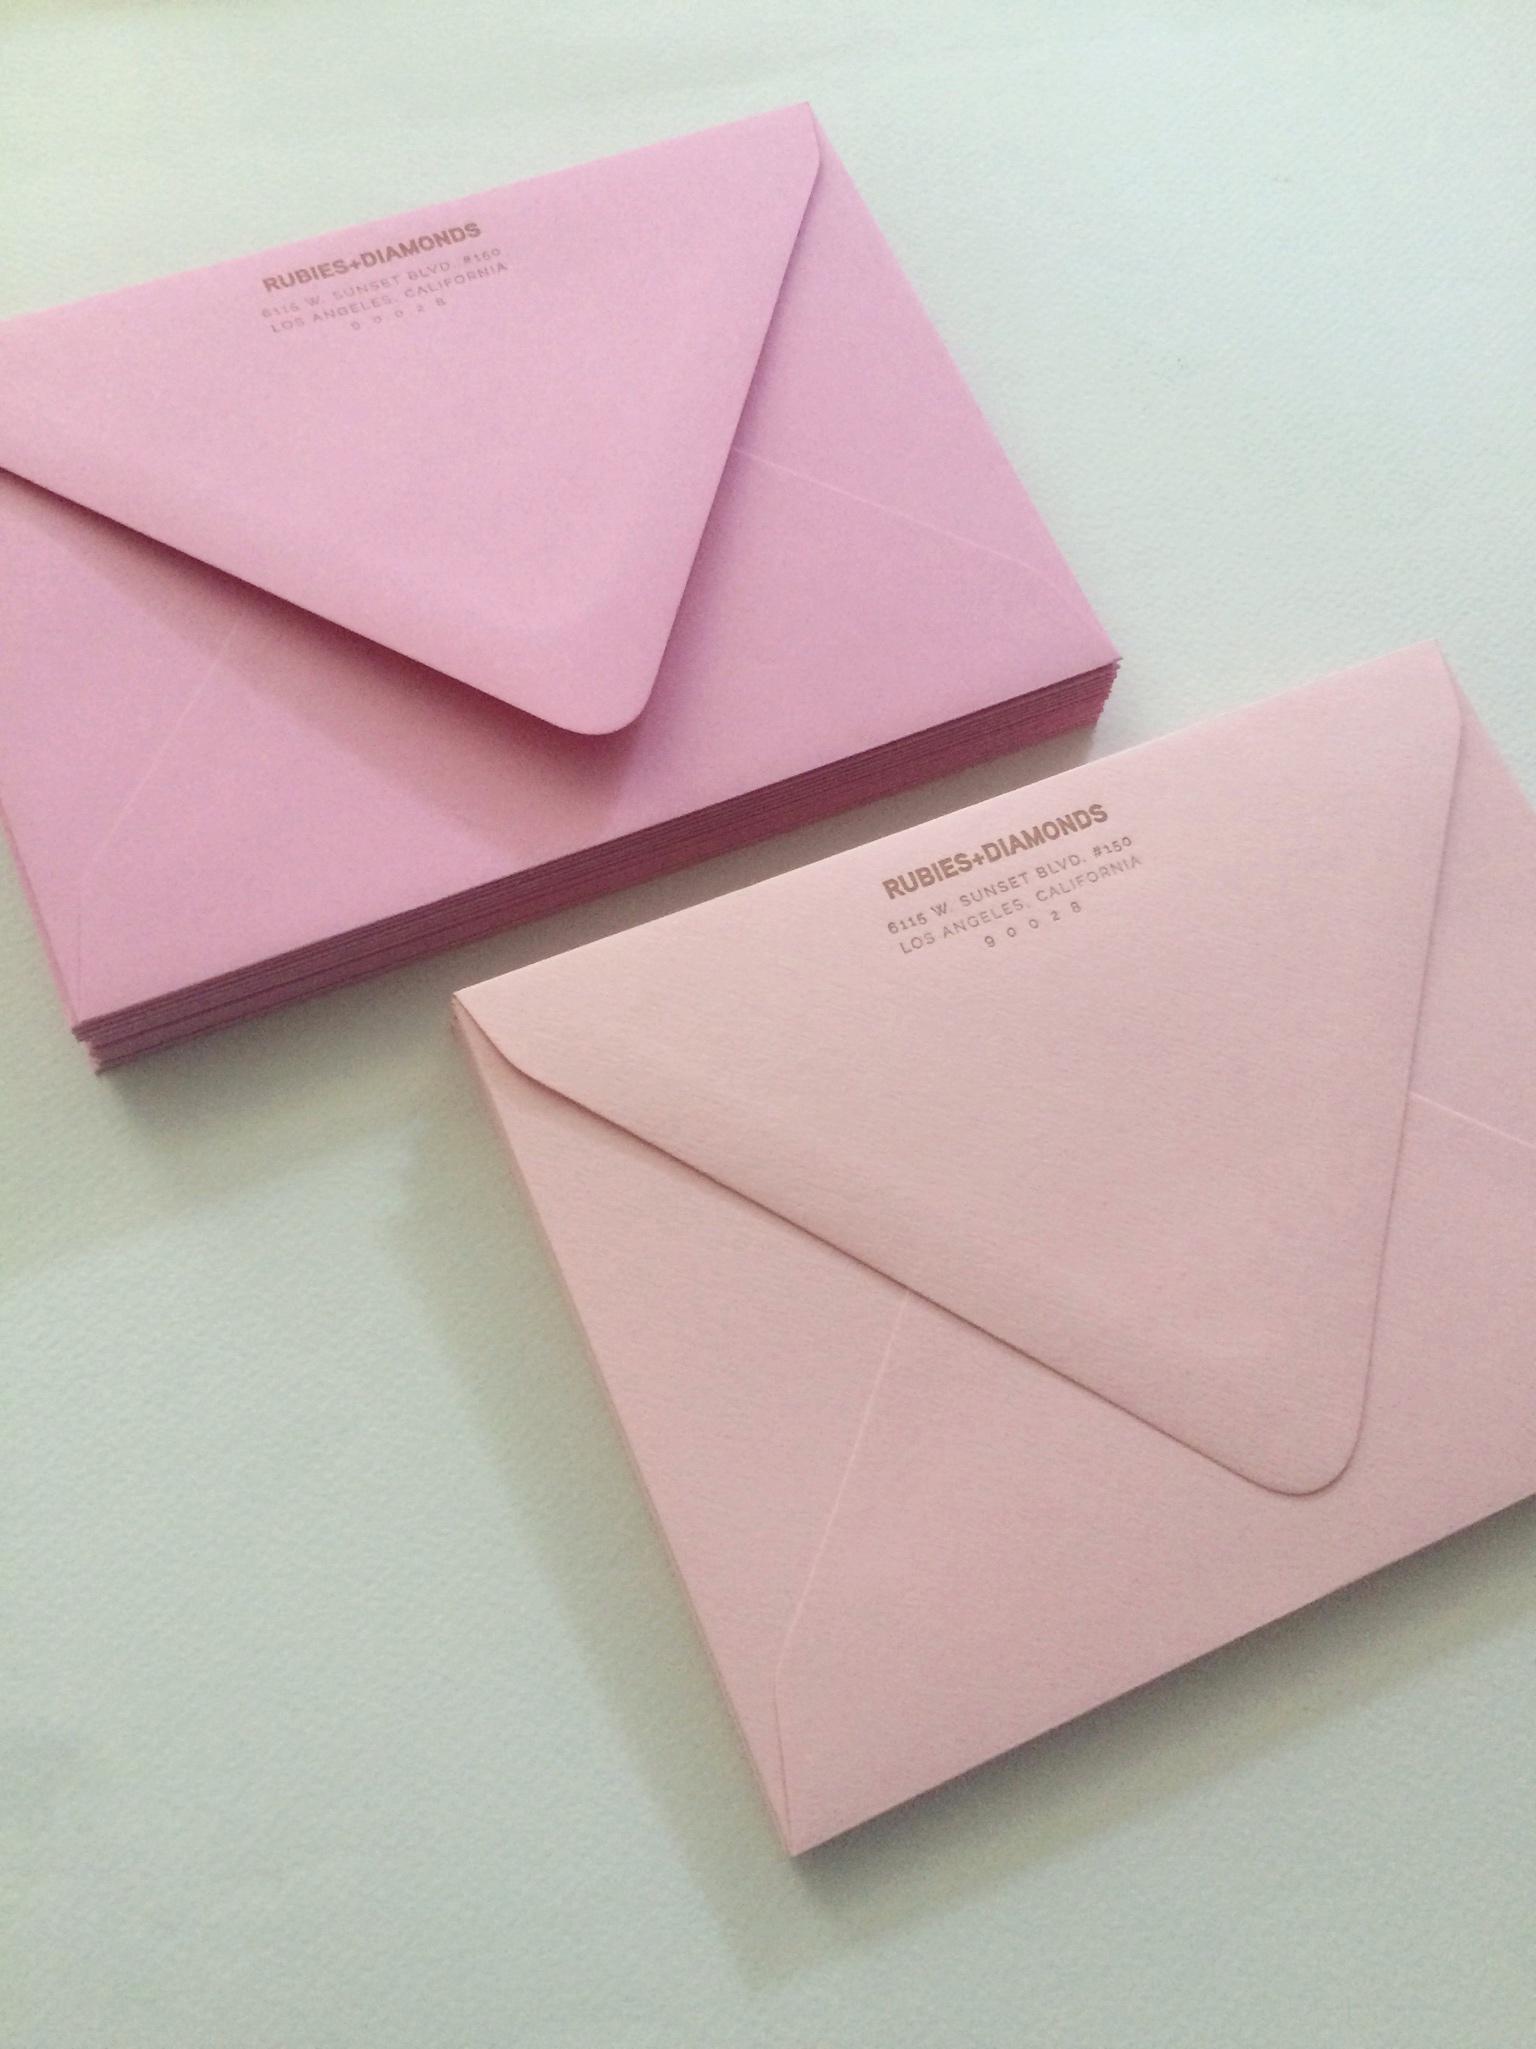 rubies and diamonds envelopes